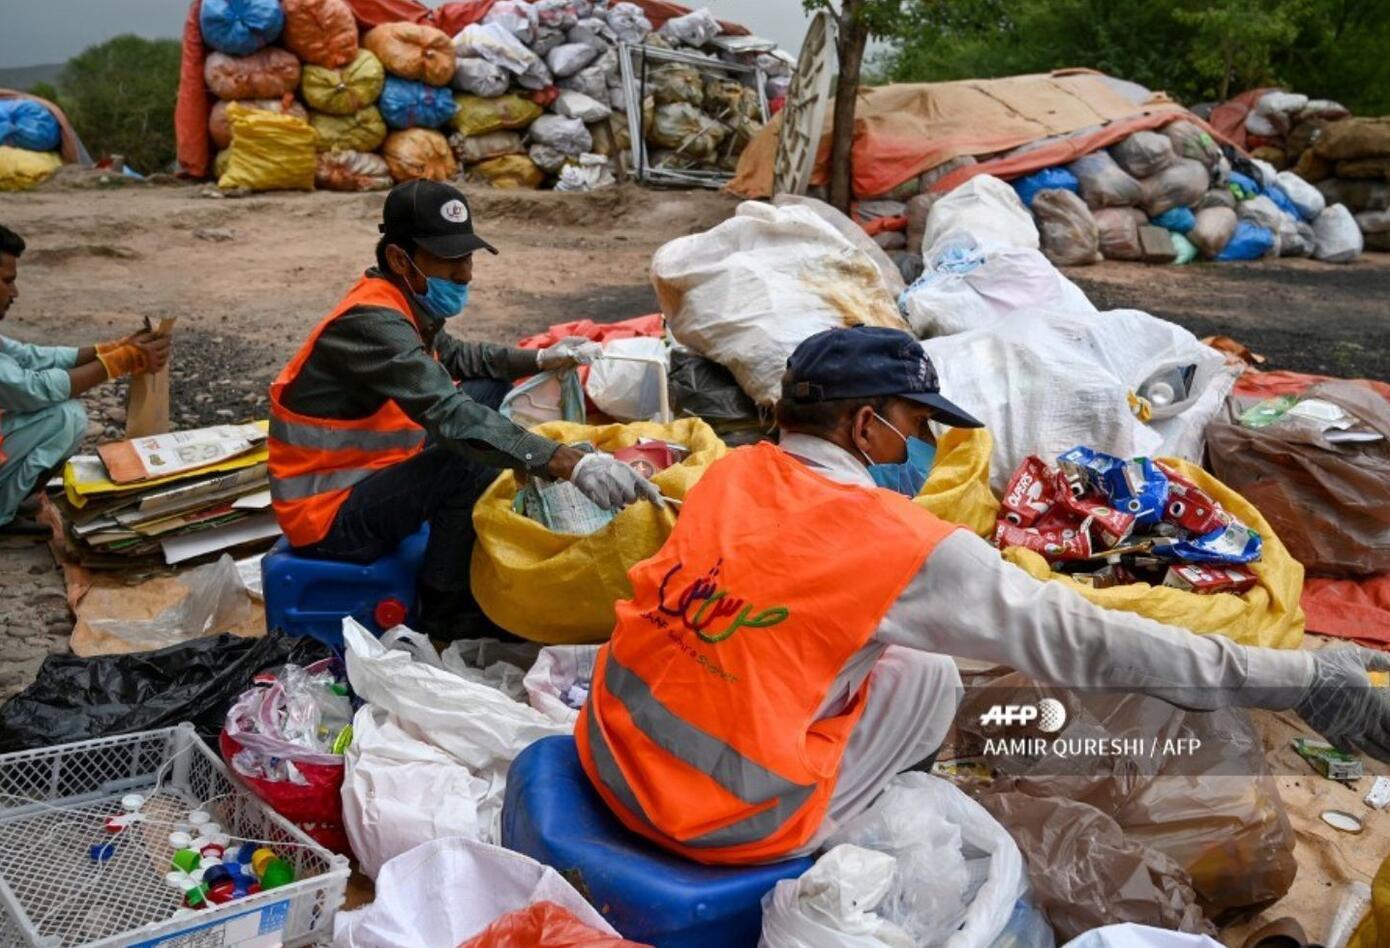 Las bolsas plásticas de uso único matan cada año a un millón de pájaros.